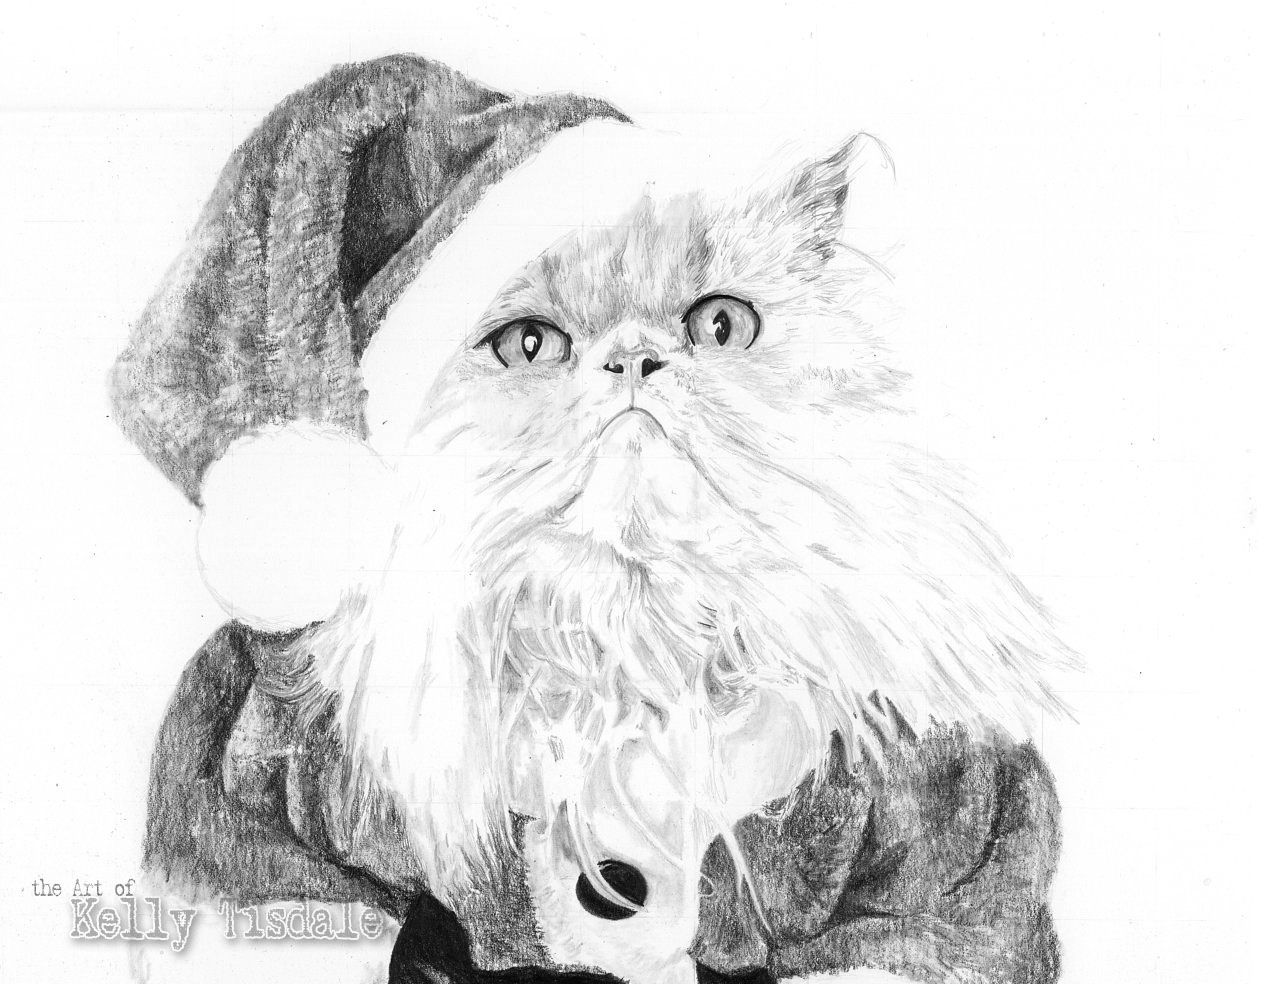 Christmas pencil drawings